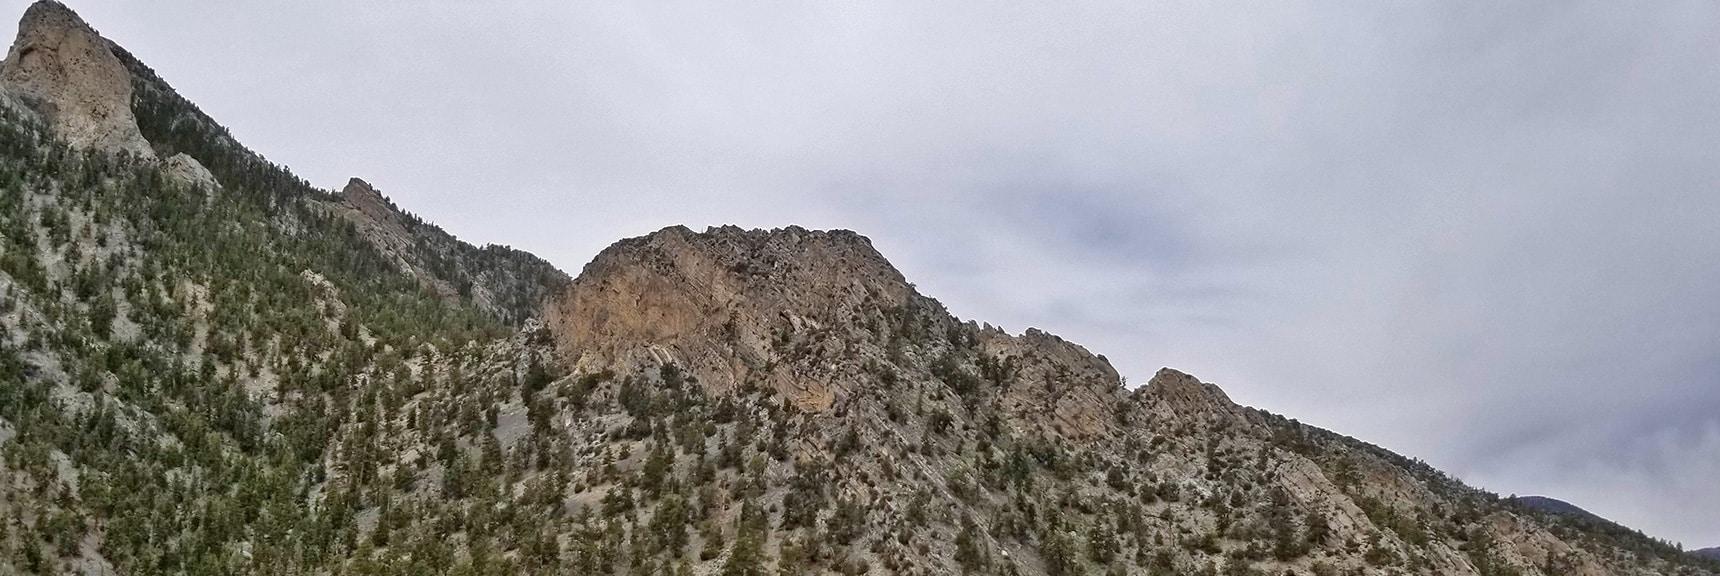 Ridge System Descending McFarland Peak Toward Bonanza Peak Viewed from 9,235ft High Point Bluff   Sawmill Trail to McFarland Peak   Spring Mountains, Nevada